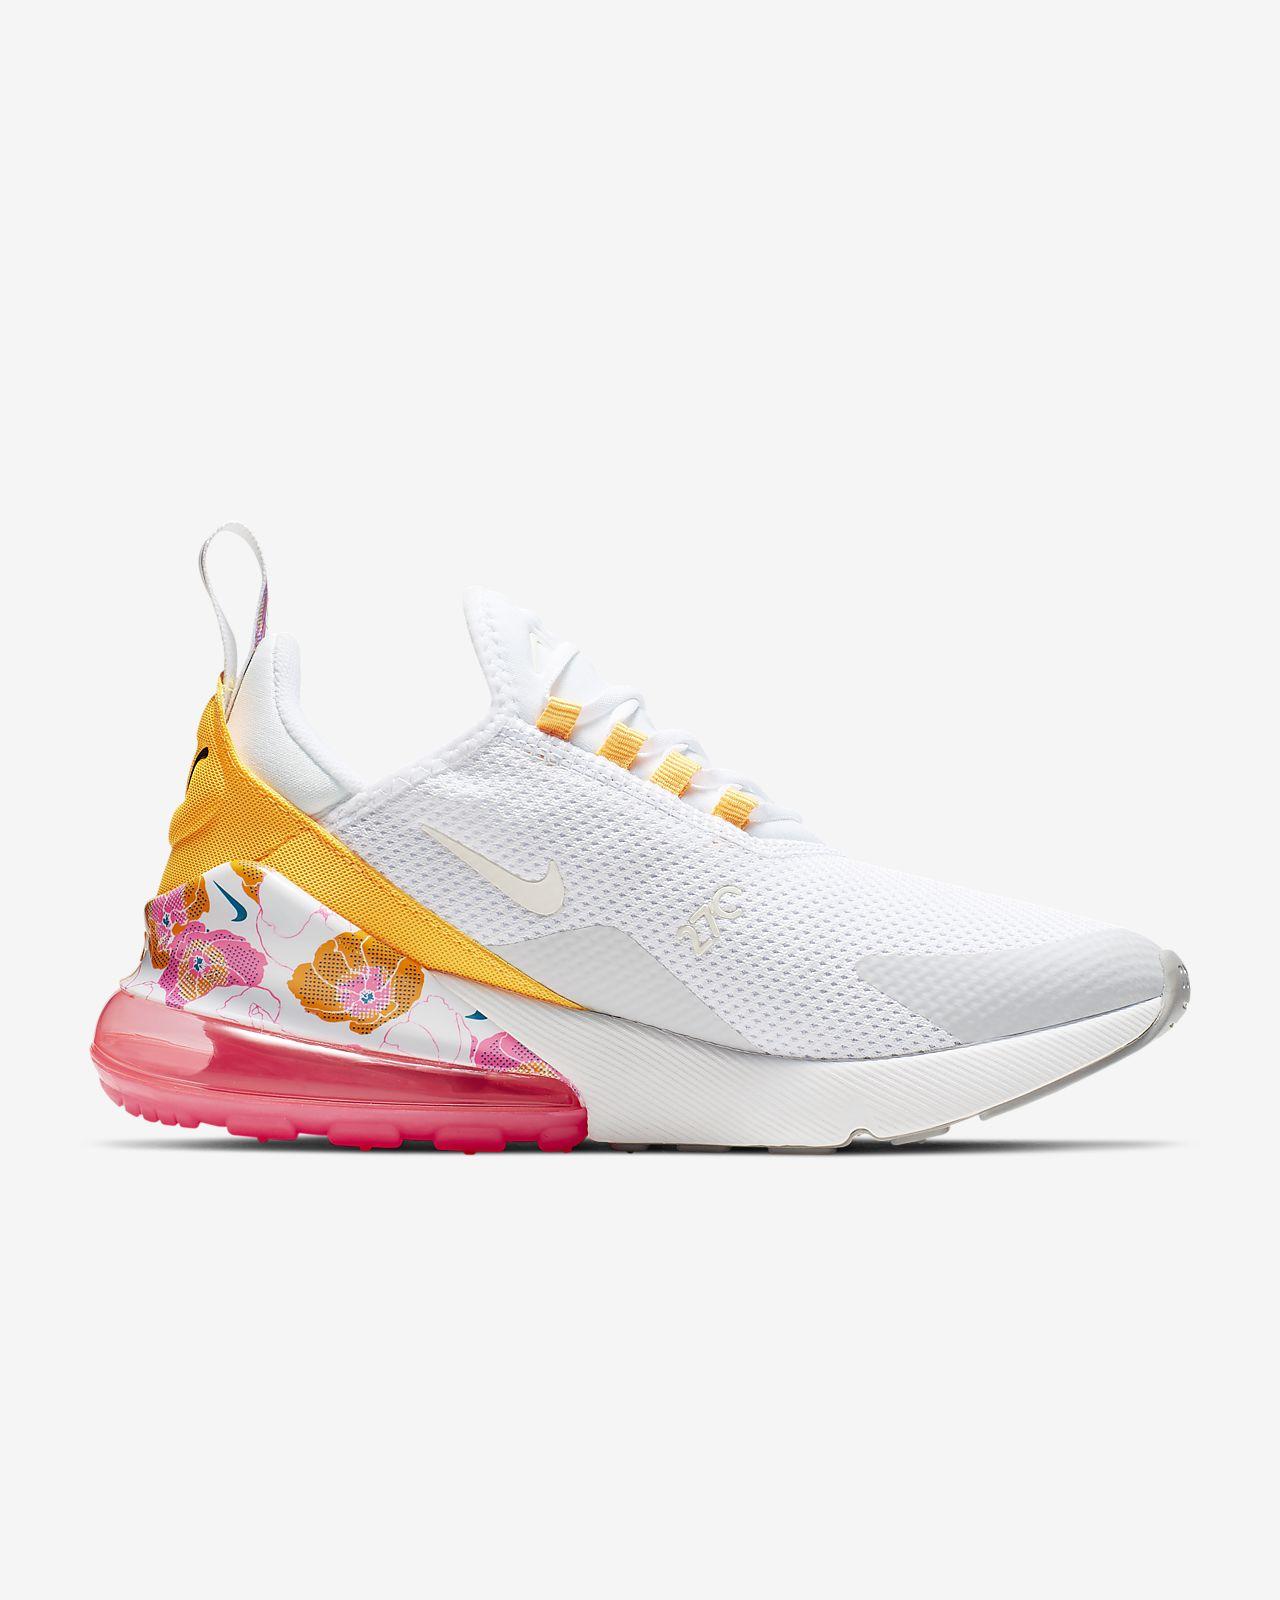 info for c7945 bc57c ... Sko Nike Air Max 270 SE Floral för kvinnor